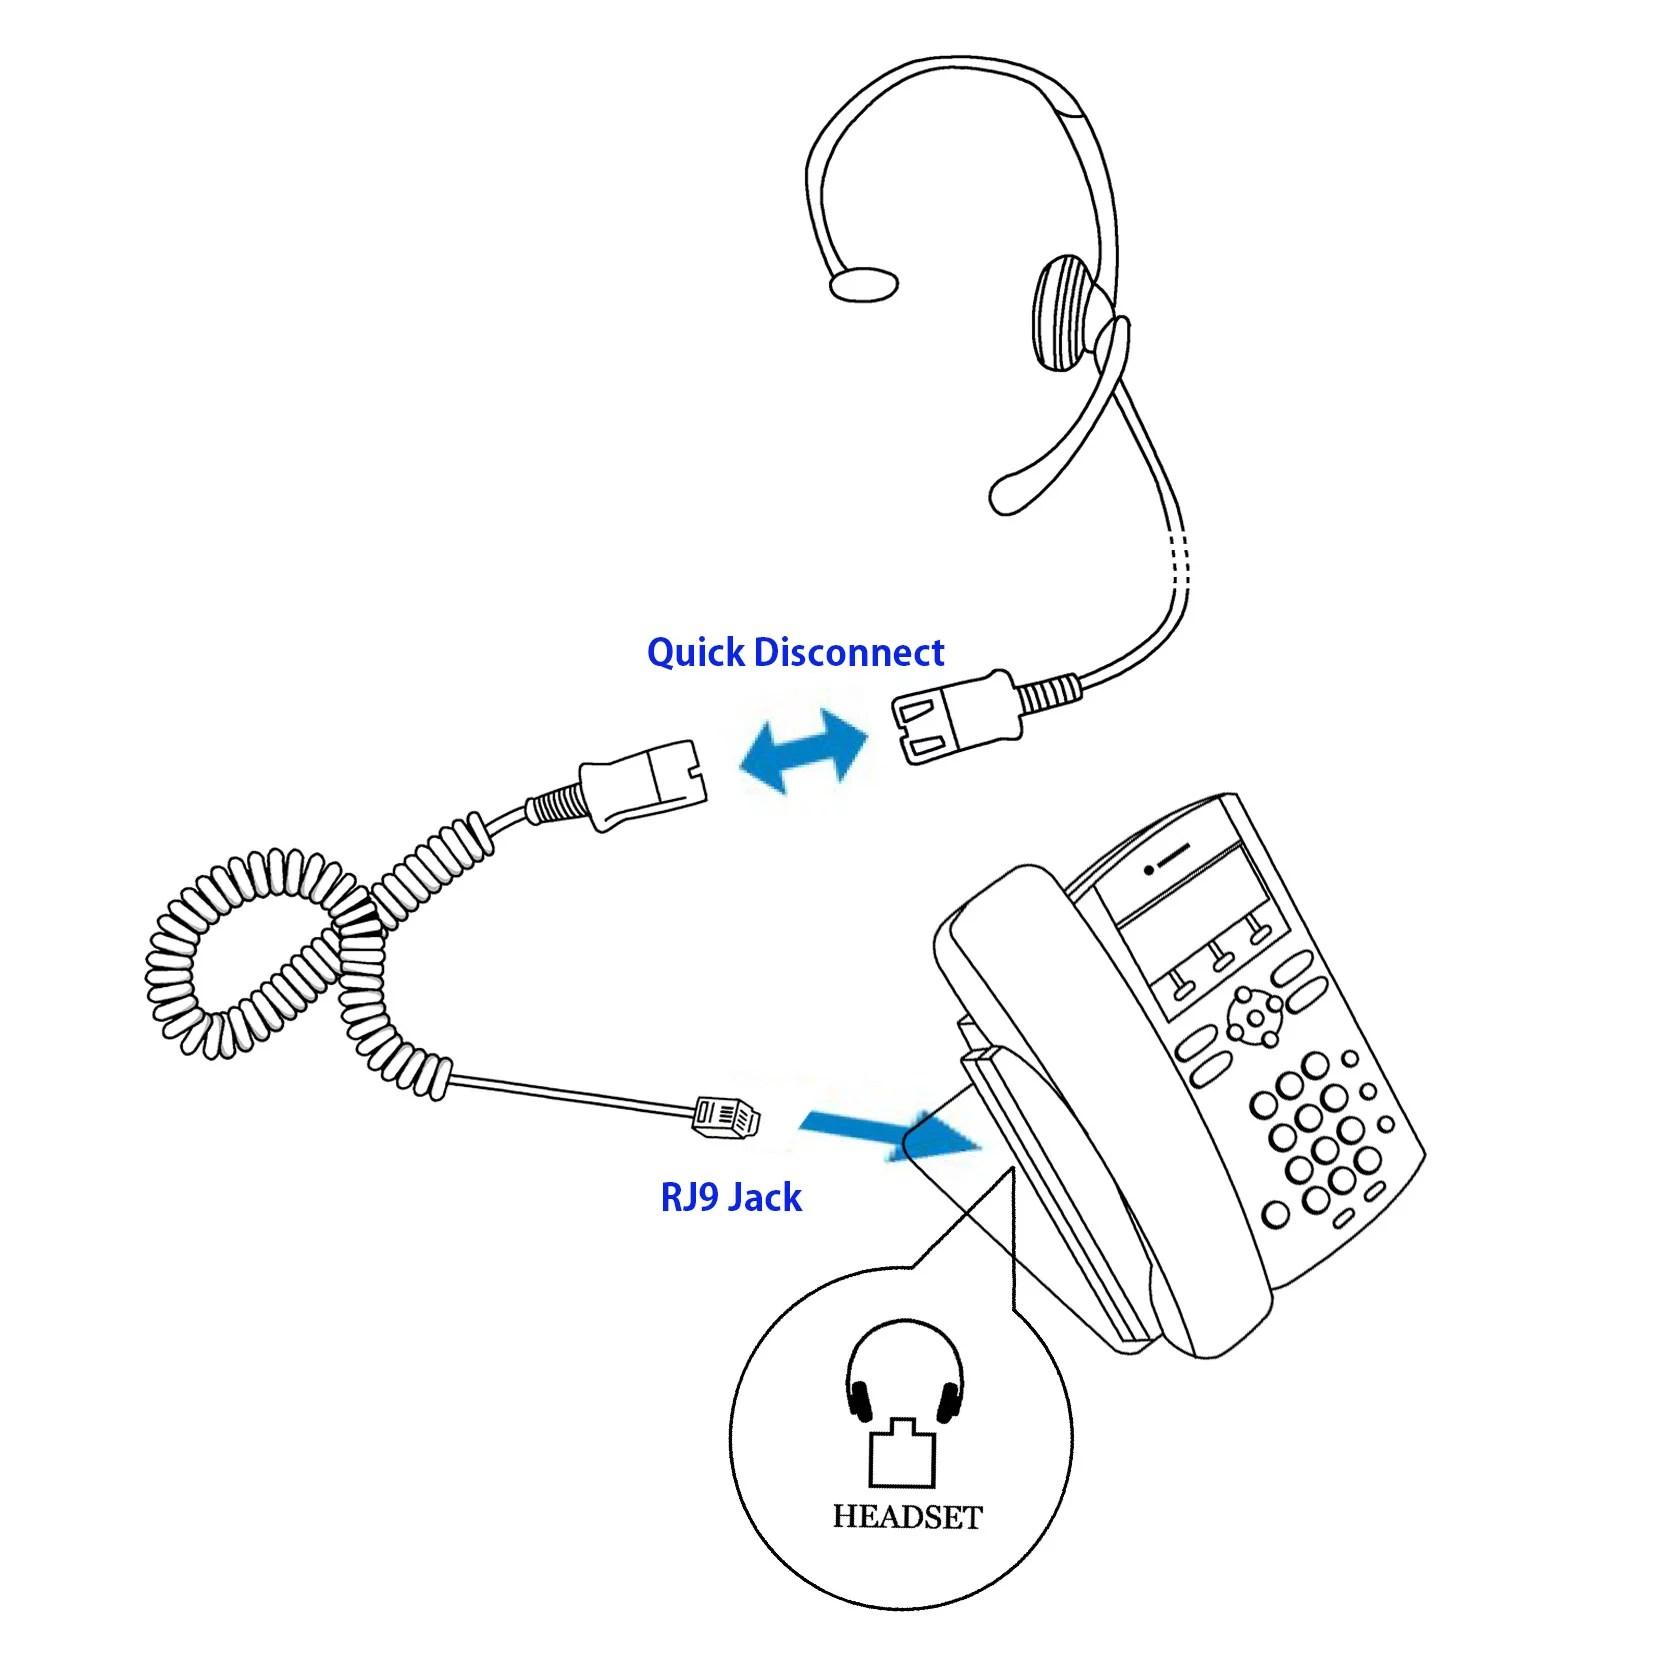 hight resolution of cisco rj9 wiring diagram wiring diagram showcisco rj9 wiring diagram wiring diagram mega cisco headset diagram